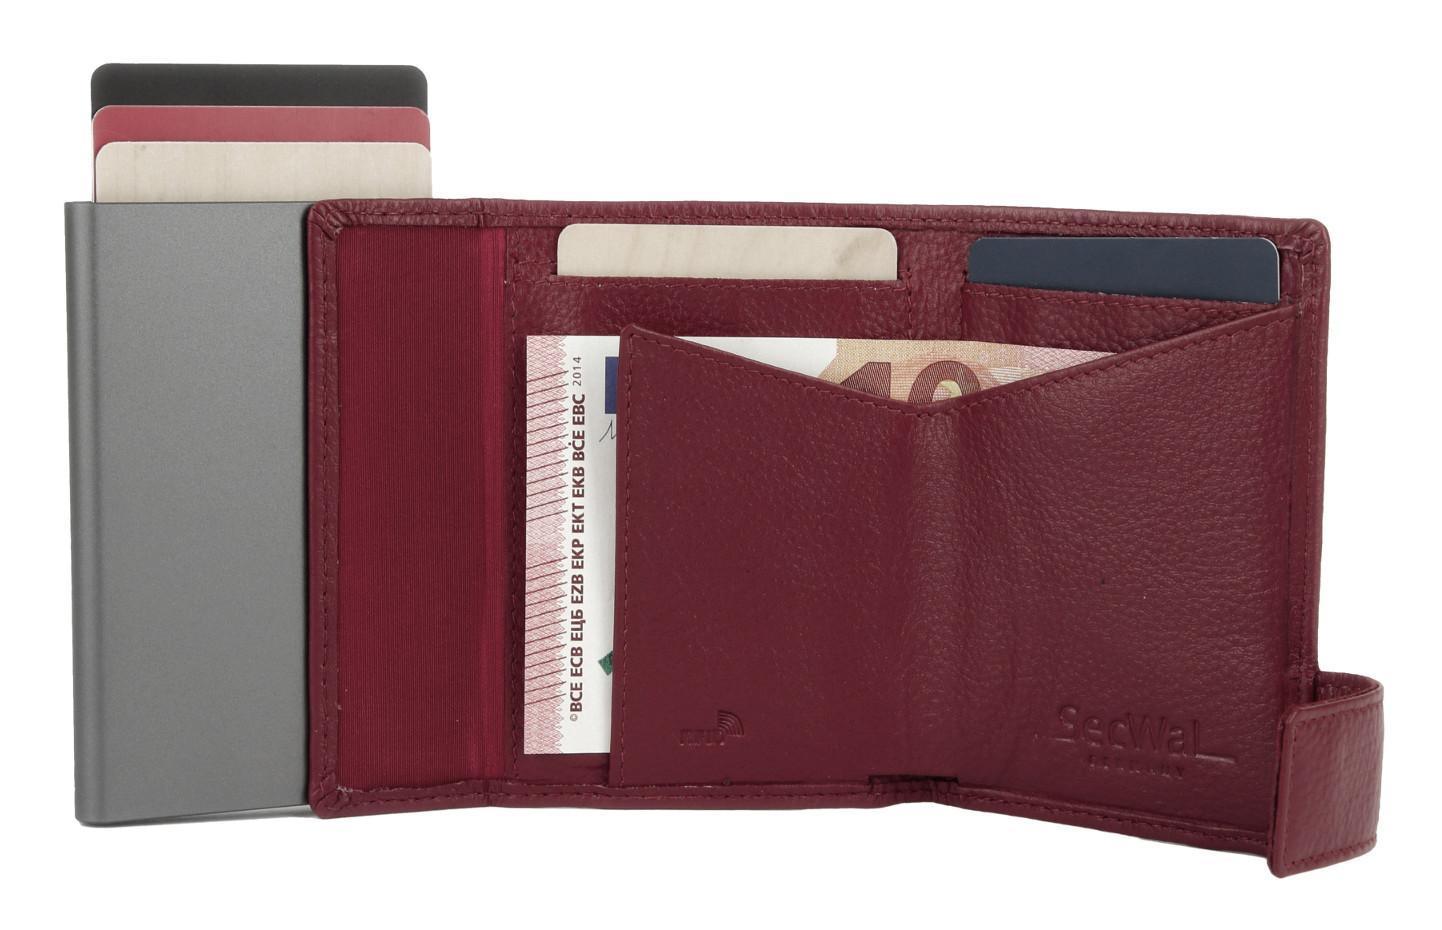 SecWal Kartenhülle Geldbörse Aluminium cherry rot